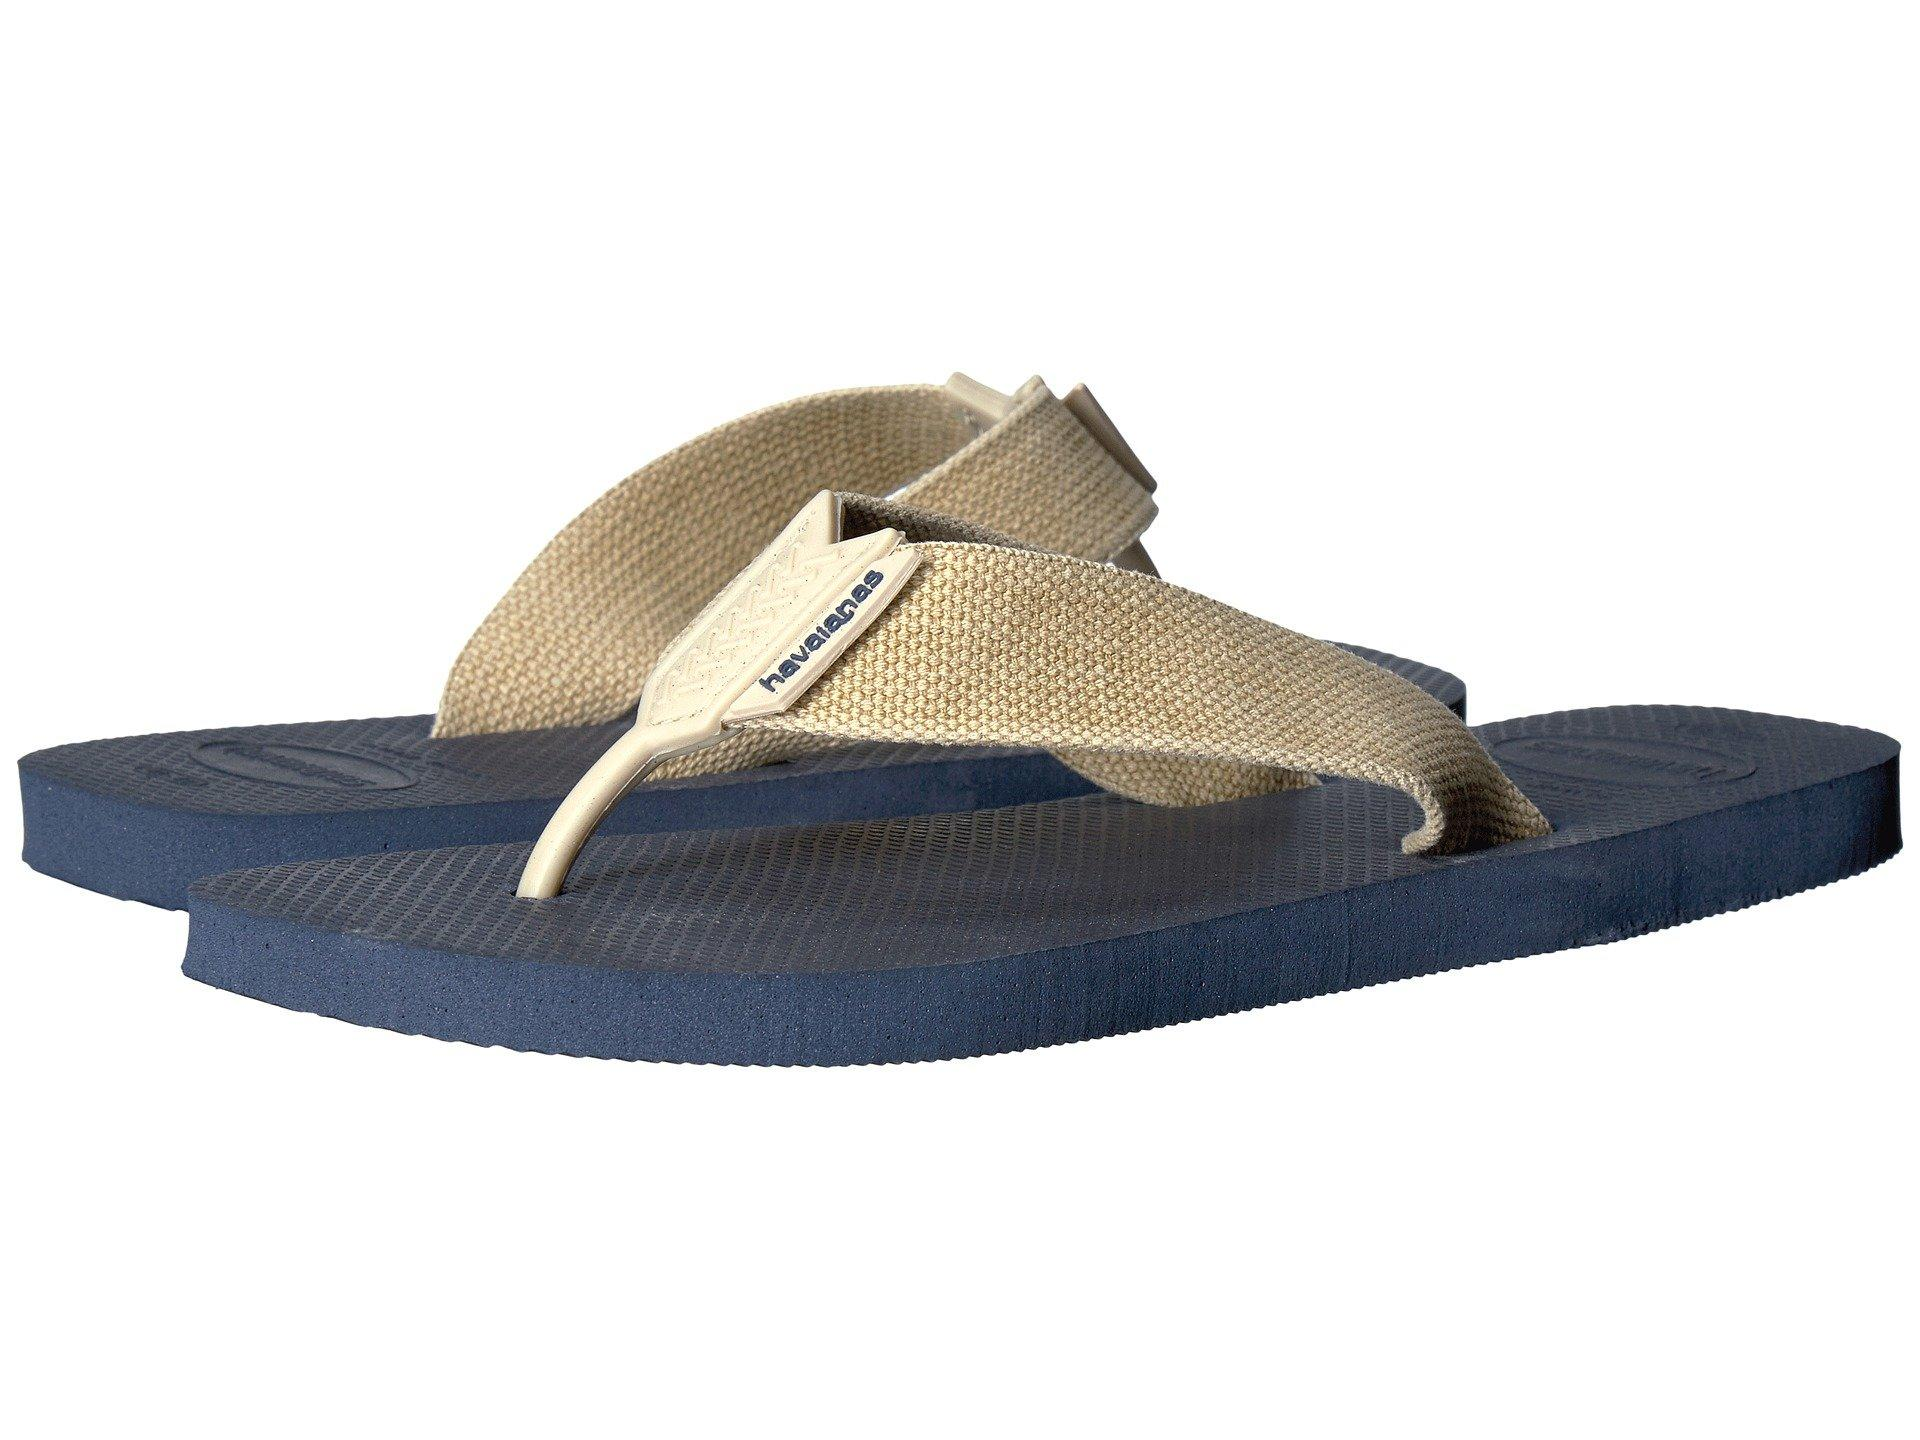 971fde71bce4 Havaianas Urban Basic Flip Flops In Navy Blue Sand Grey